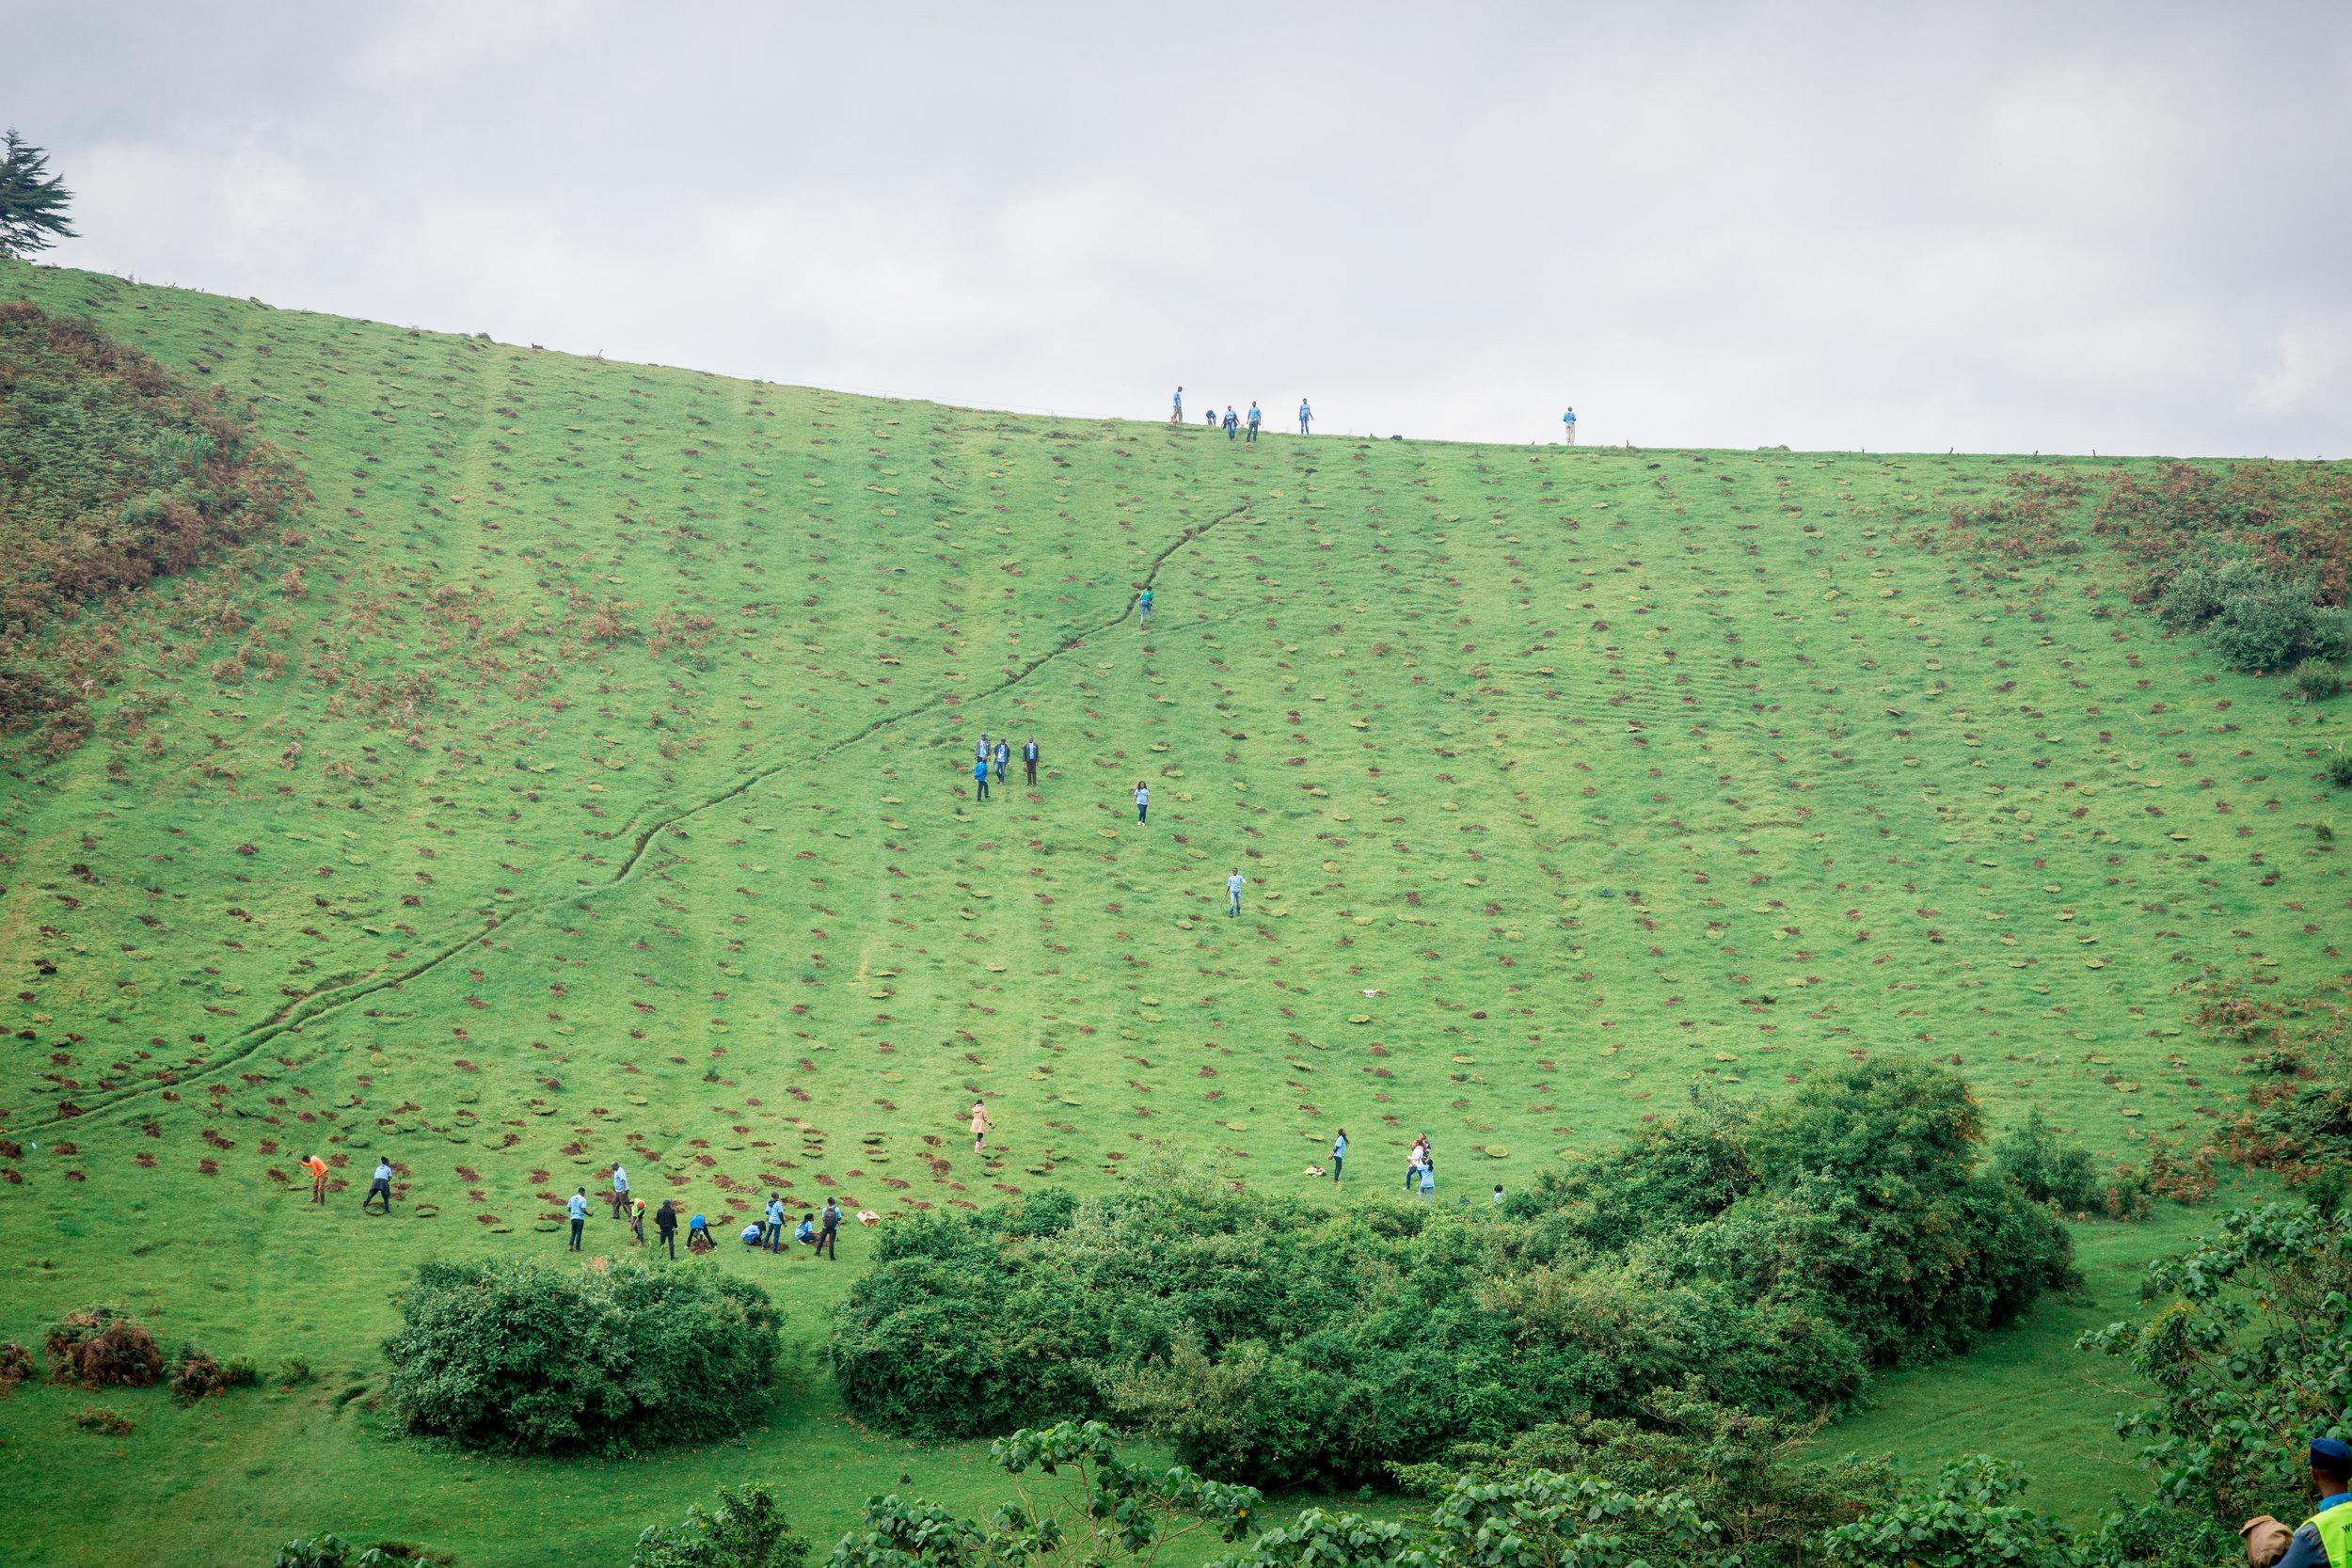 Citi GCD2018 - Date: 09/o6/2019Venue: Ngong road Forest Section 5 near Bomas of KenyaTrees Planted: 5000#GCD2019 #CitiVolunteers #TUNAPANDAMITI